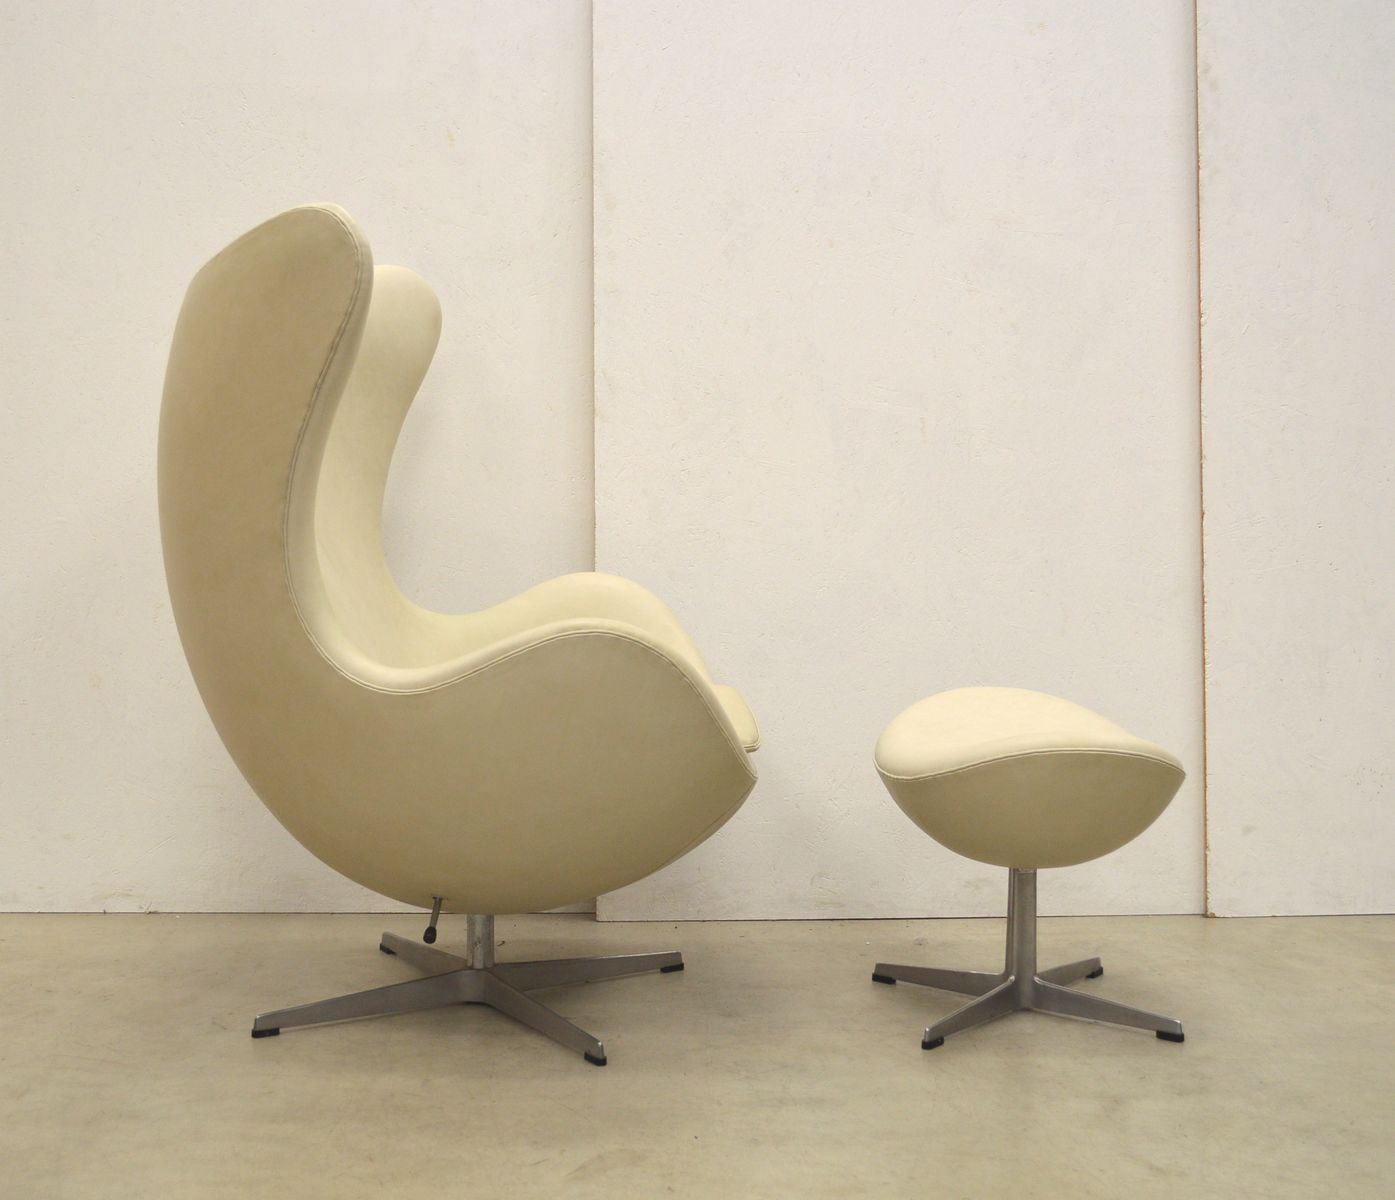 Cream Egg Chair Amp Ottoman By Arne Jacobsen For Fritz Hansen 1979 For Sale At Pamono